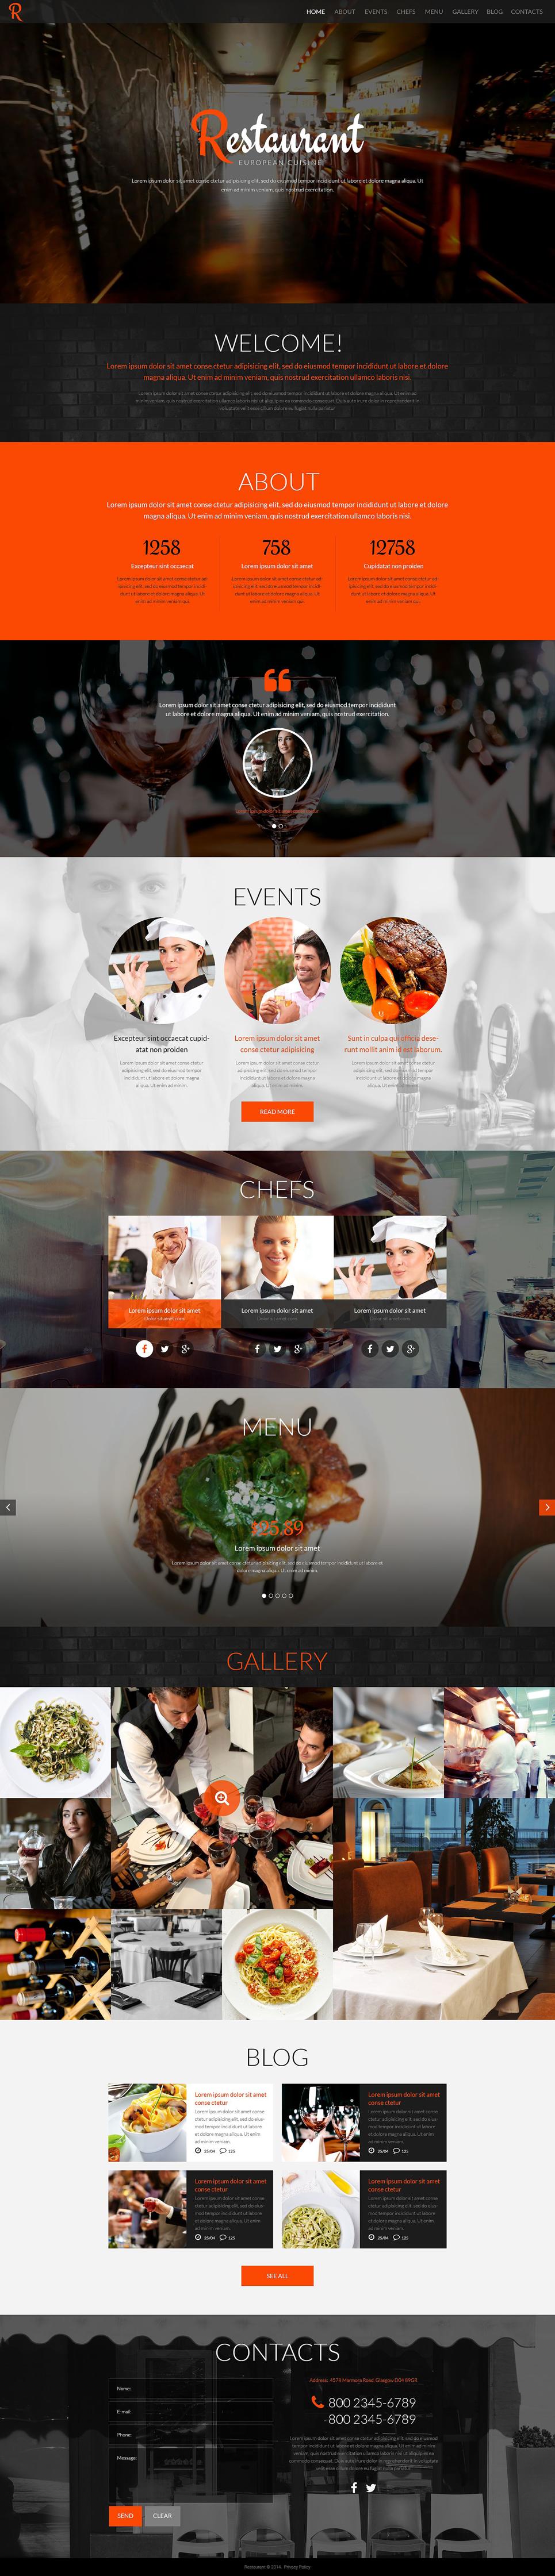 Адаптивный шаблон сайта на тему кафе и ресторан #52083